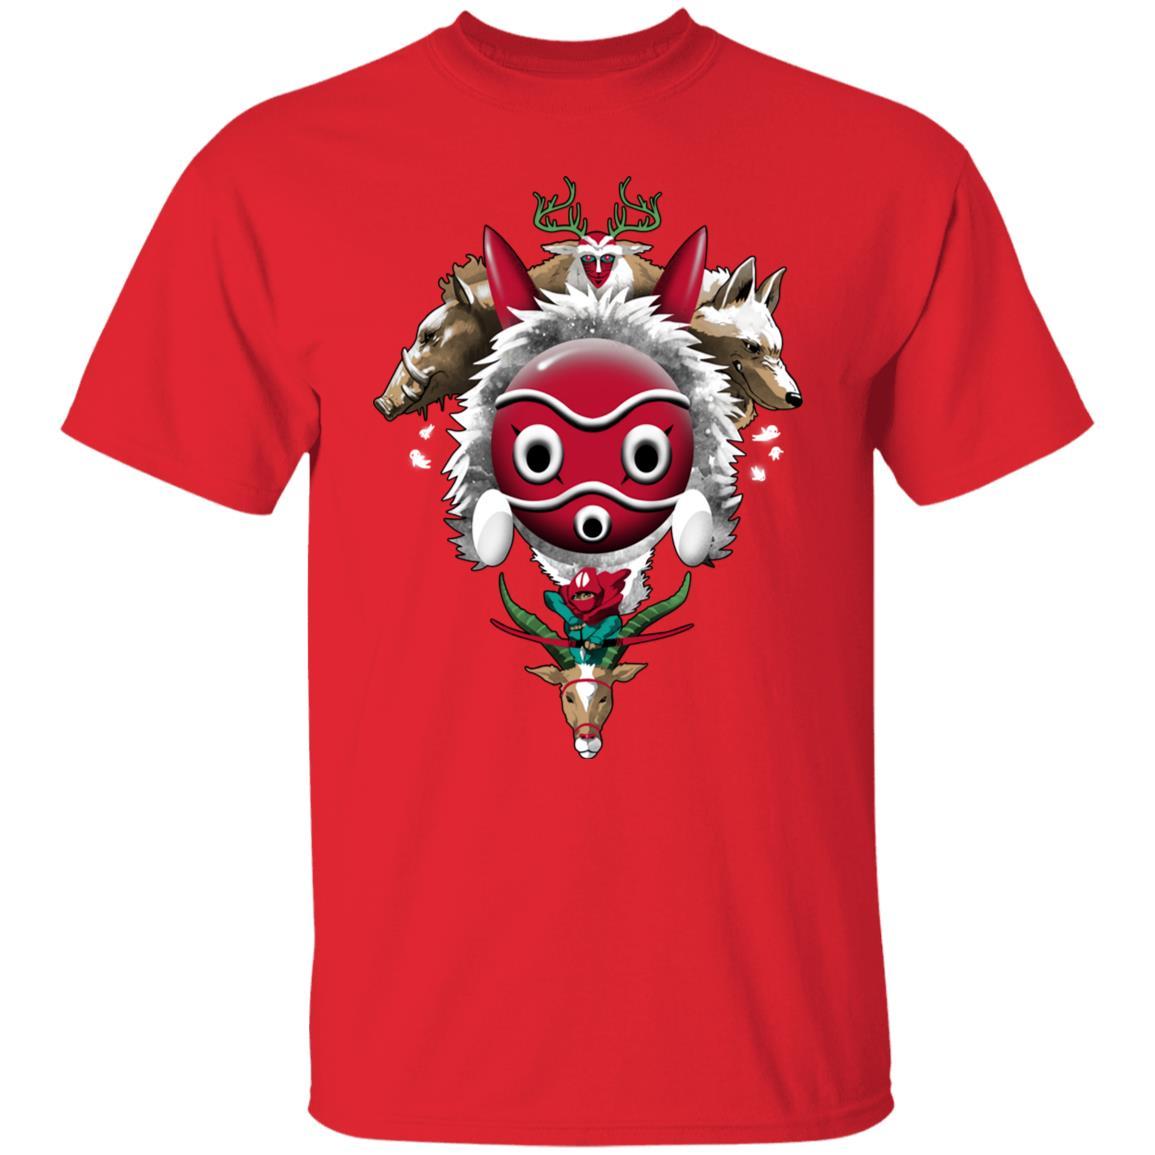 Princess Mononoke – The Forest Protectors T Shirt